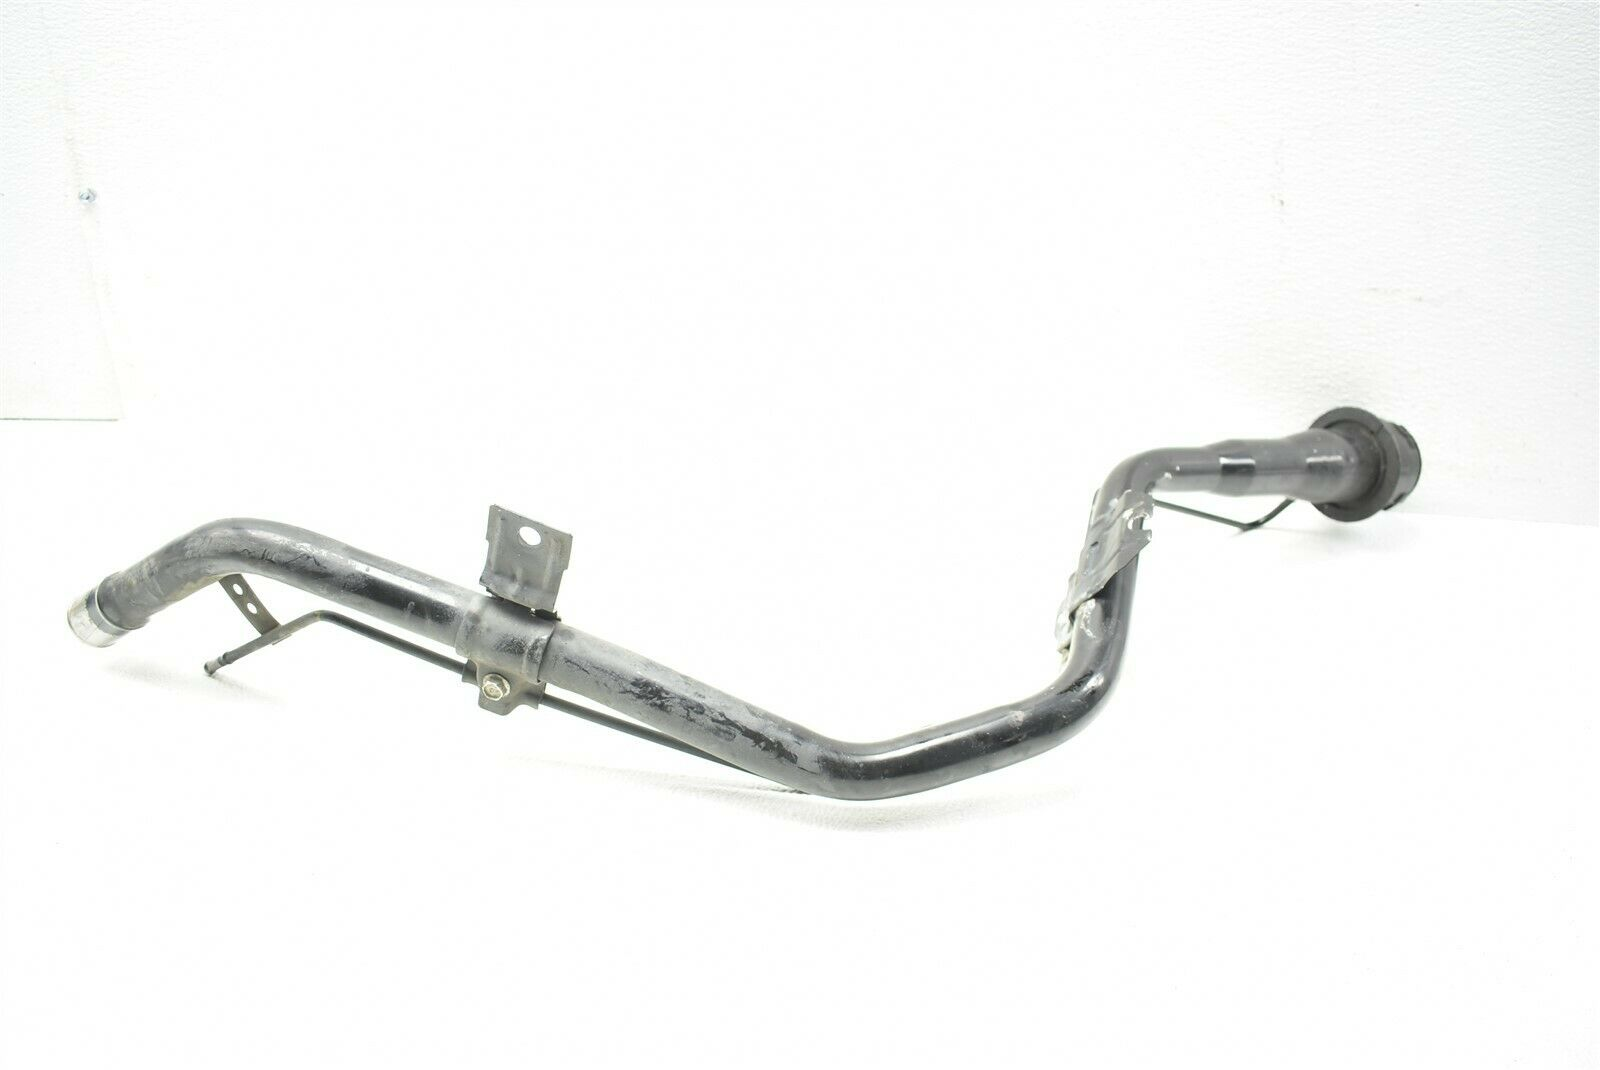 Subaru Crosstrek Gas Fuel Filler Neck Hose